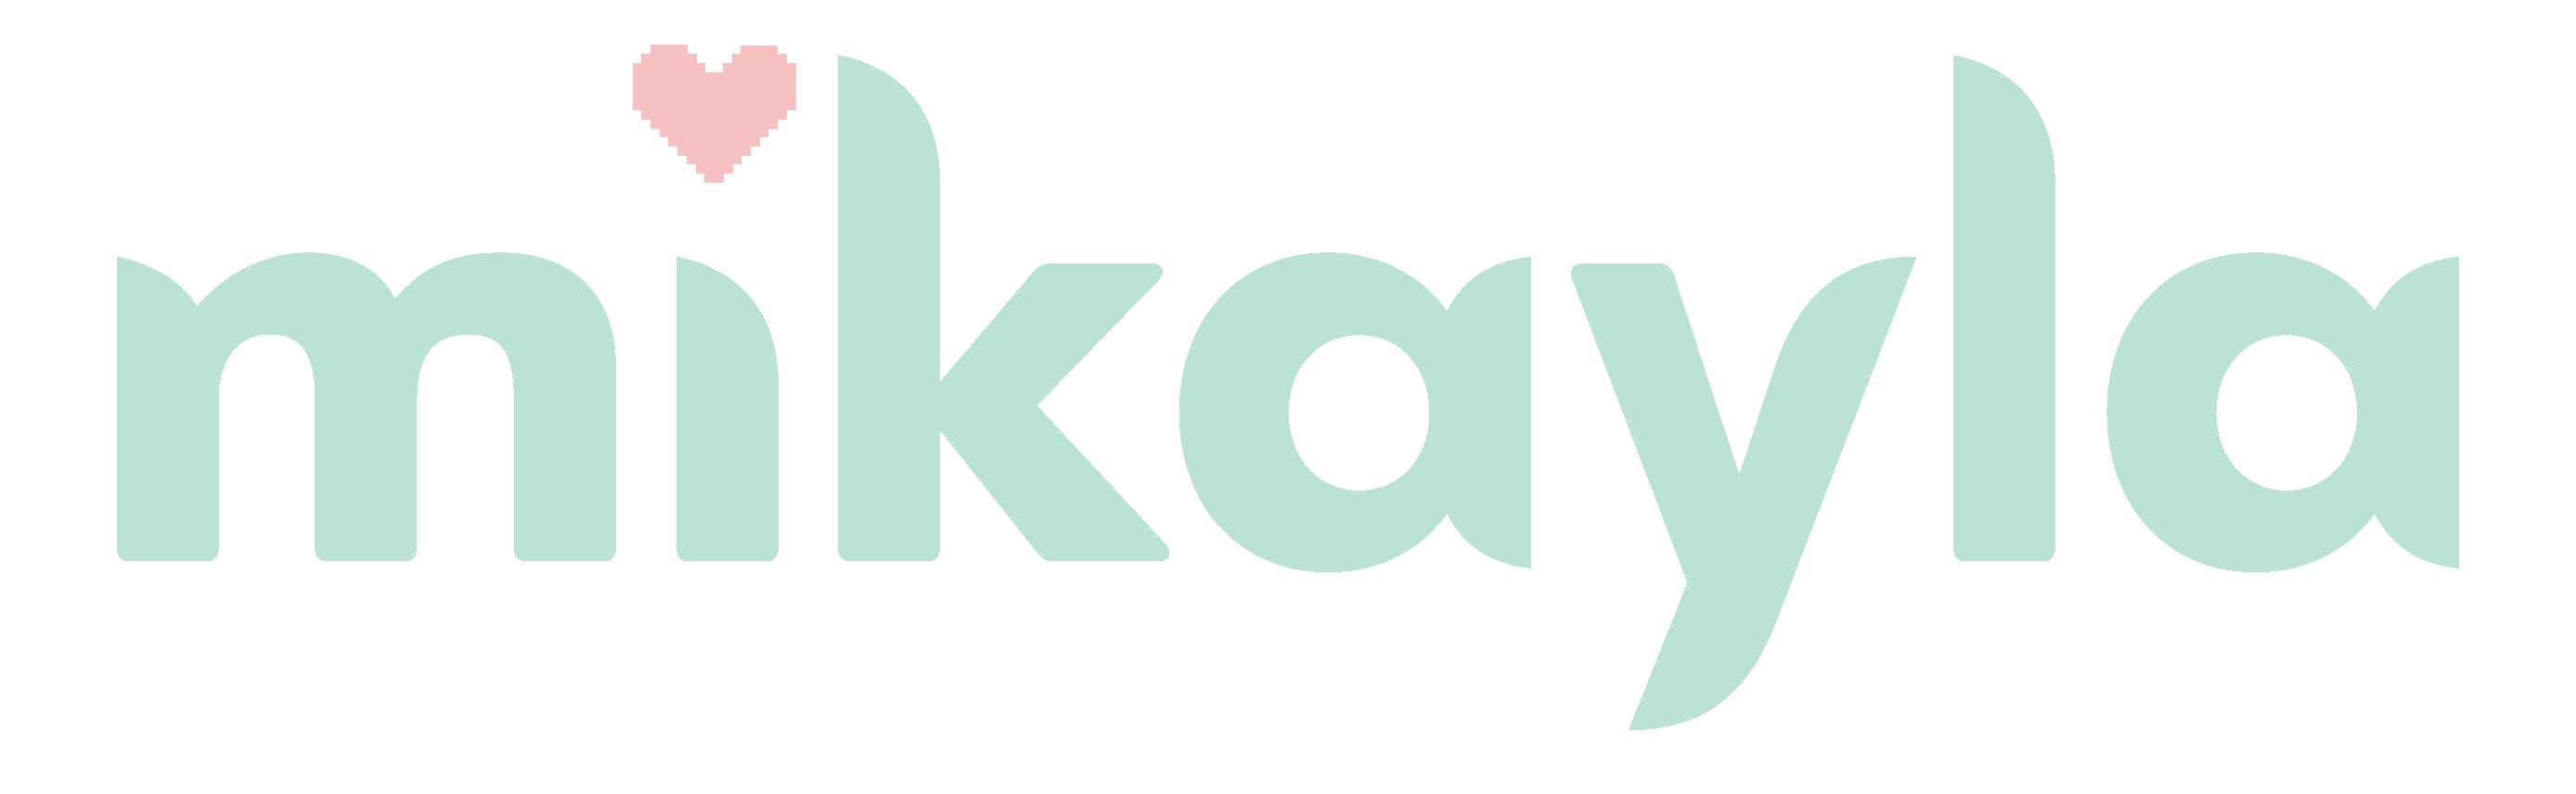 Mikayla's Designs